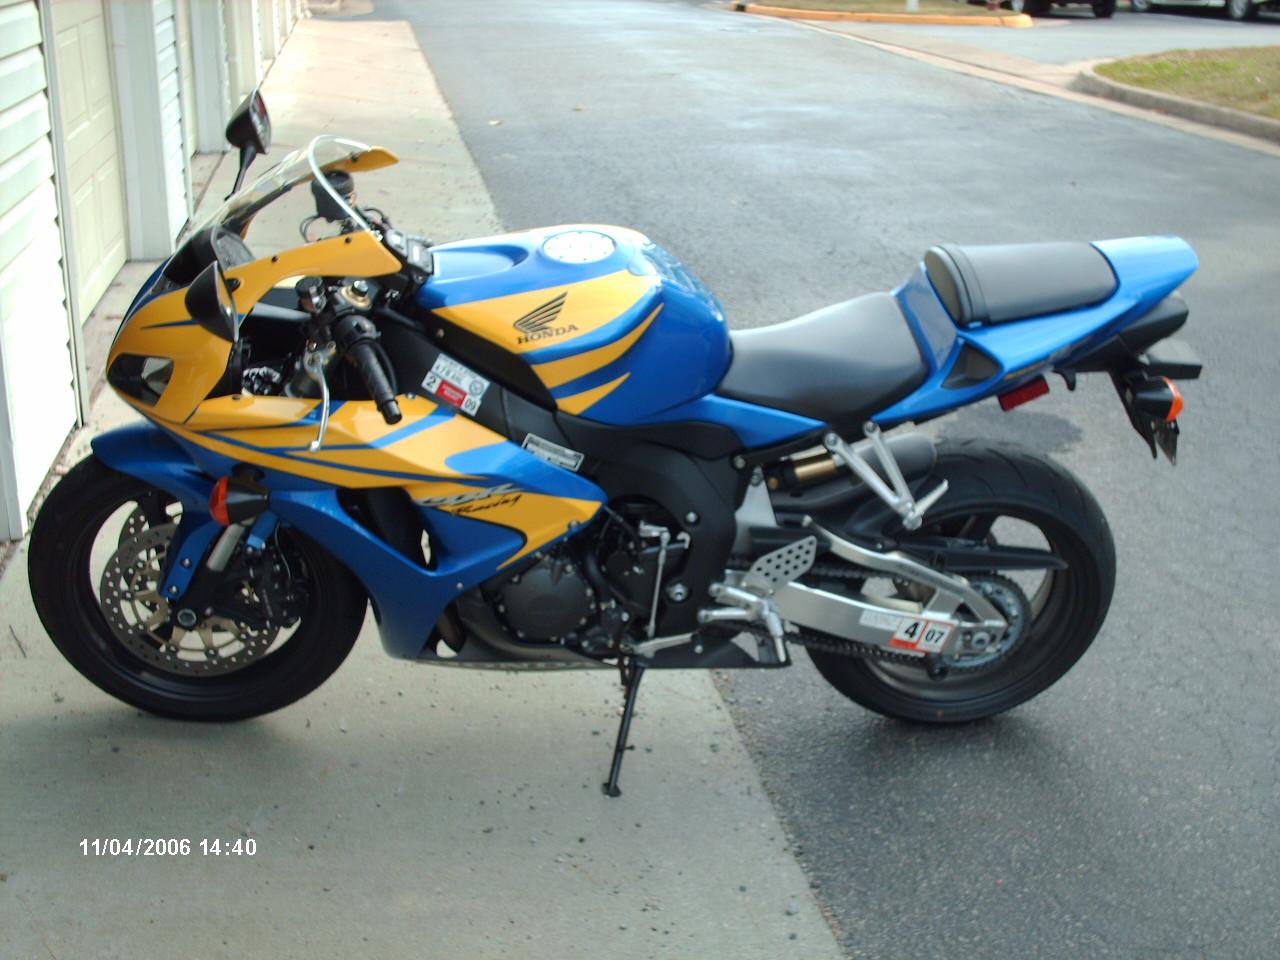 06 CBR 1000rr bodywork - Sportbikes.net